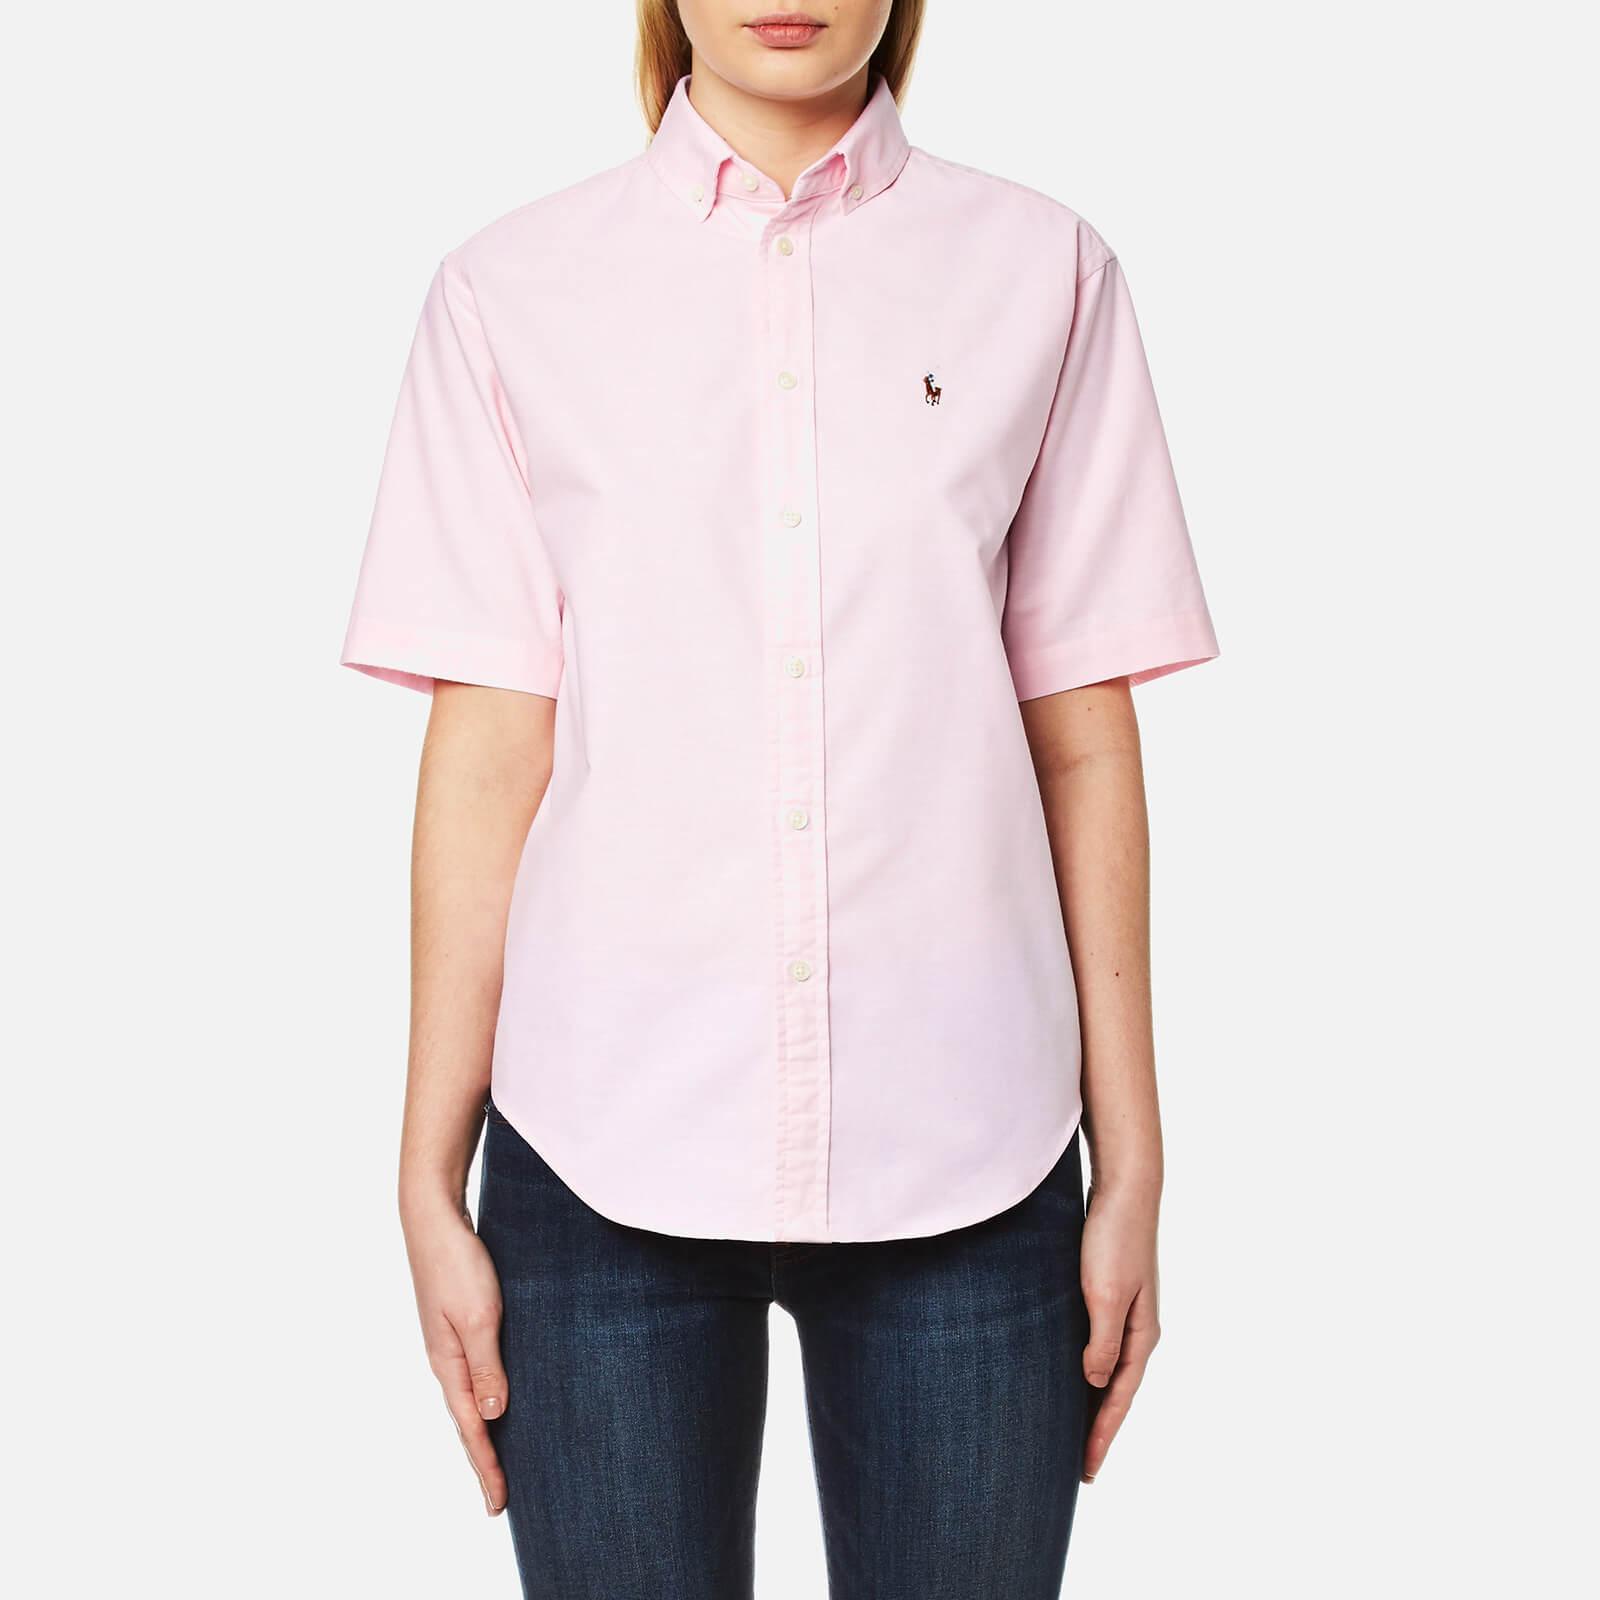 Shirt Polo Deco Pink Lauren Women's Ralph Short Sleeve eED9IWH2Yb